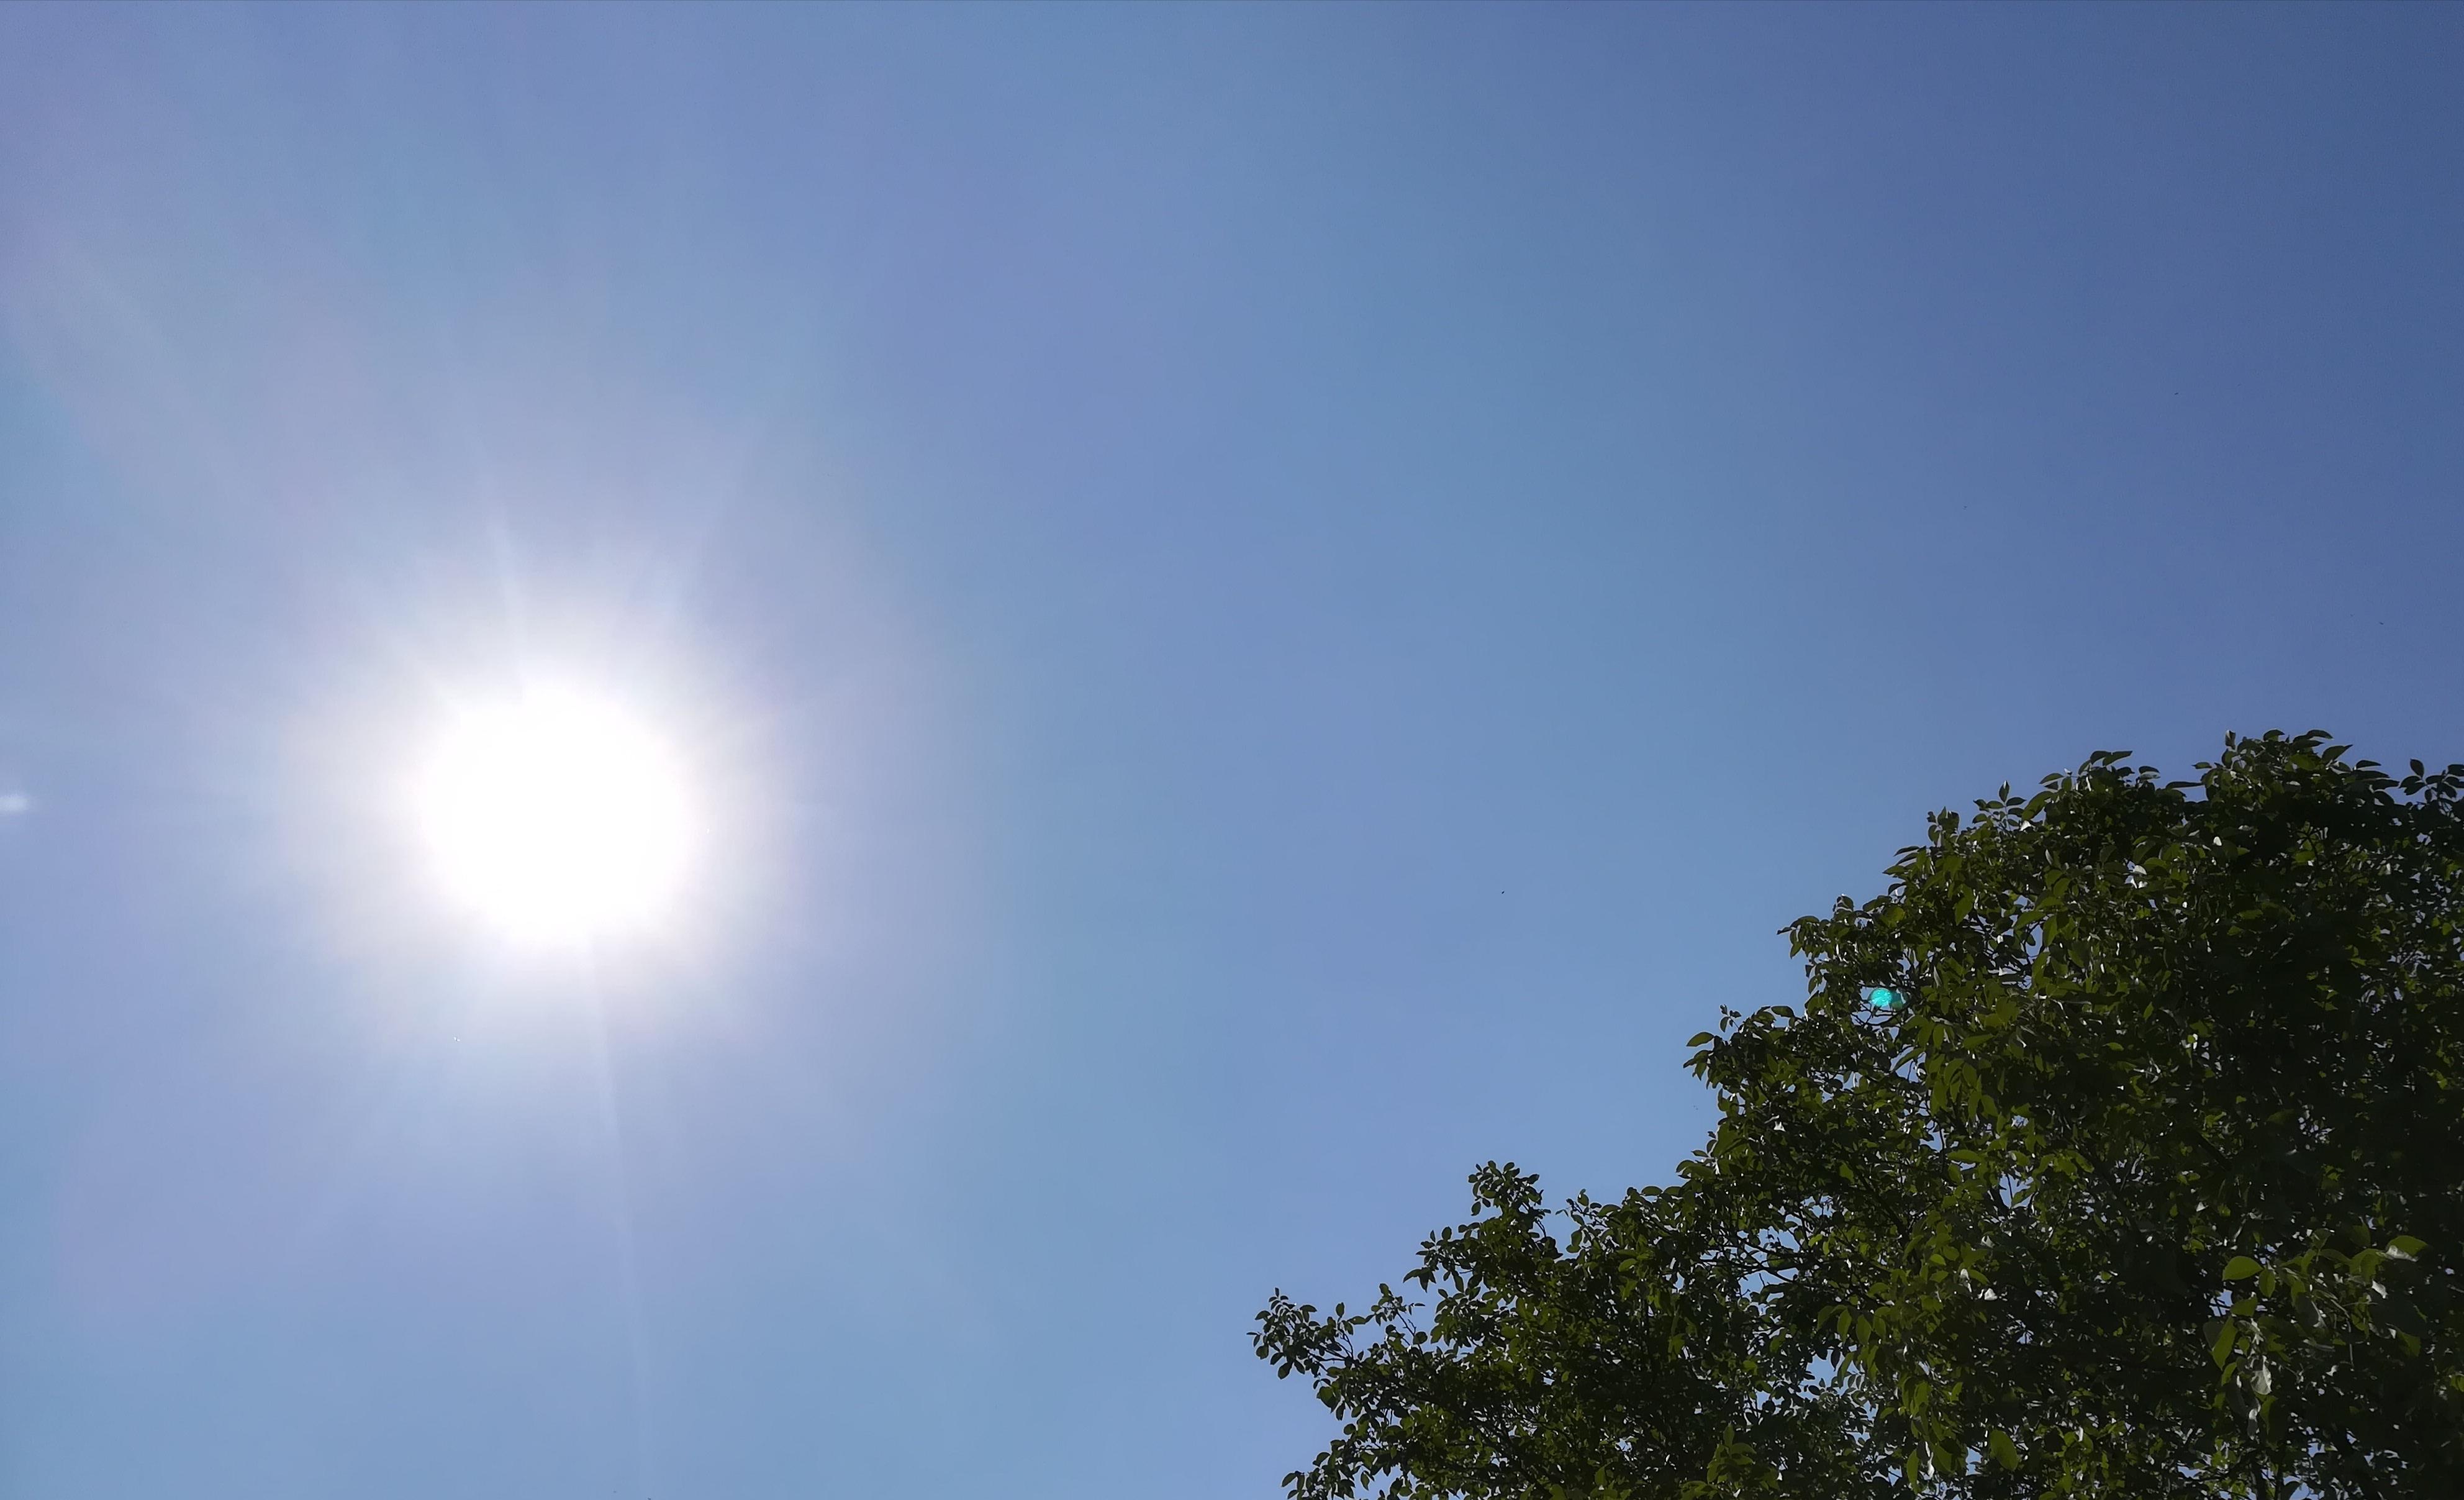 METEOS: U NEDELJU VEOMA TOPLO, TEMPERATURA DO 35°C